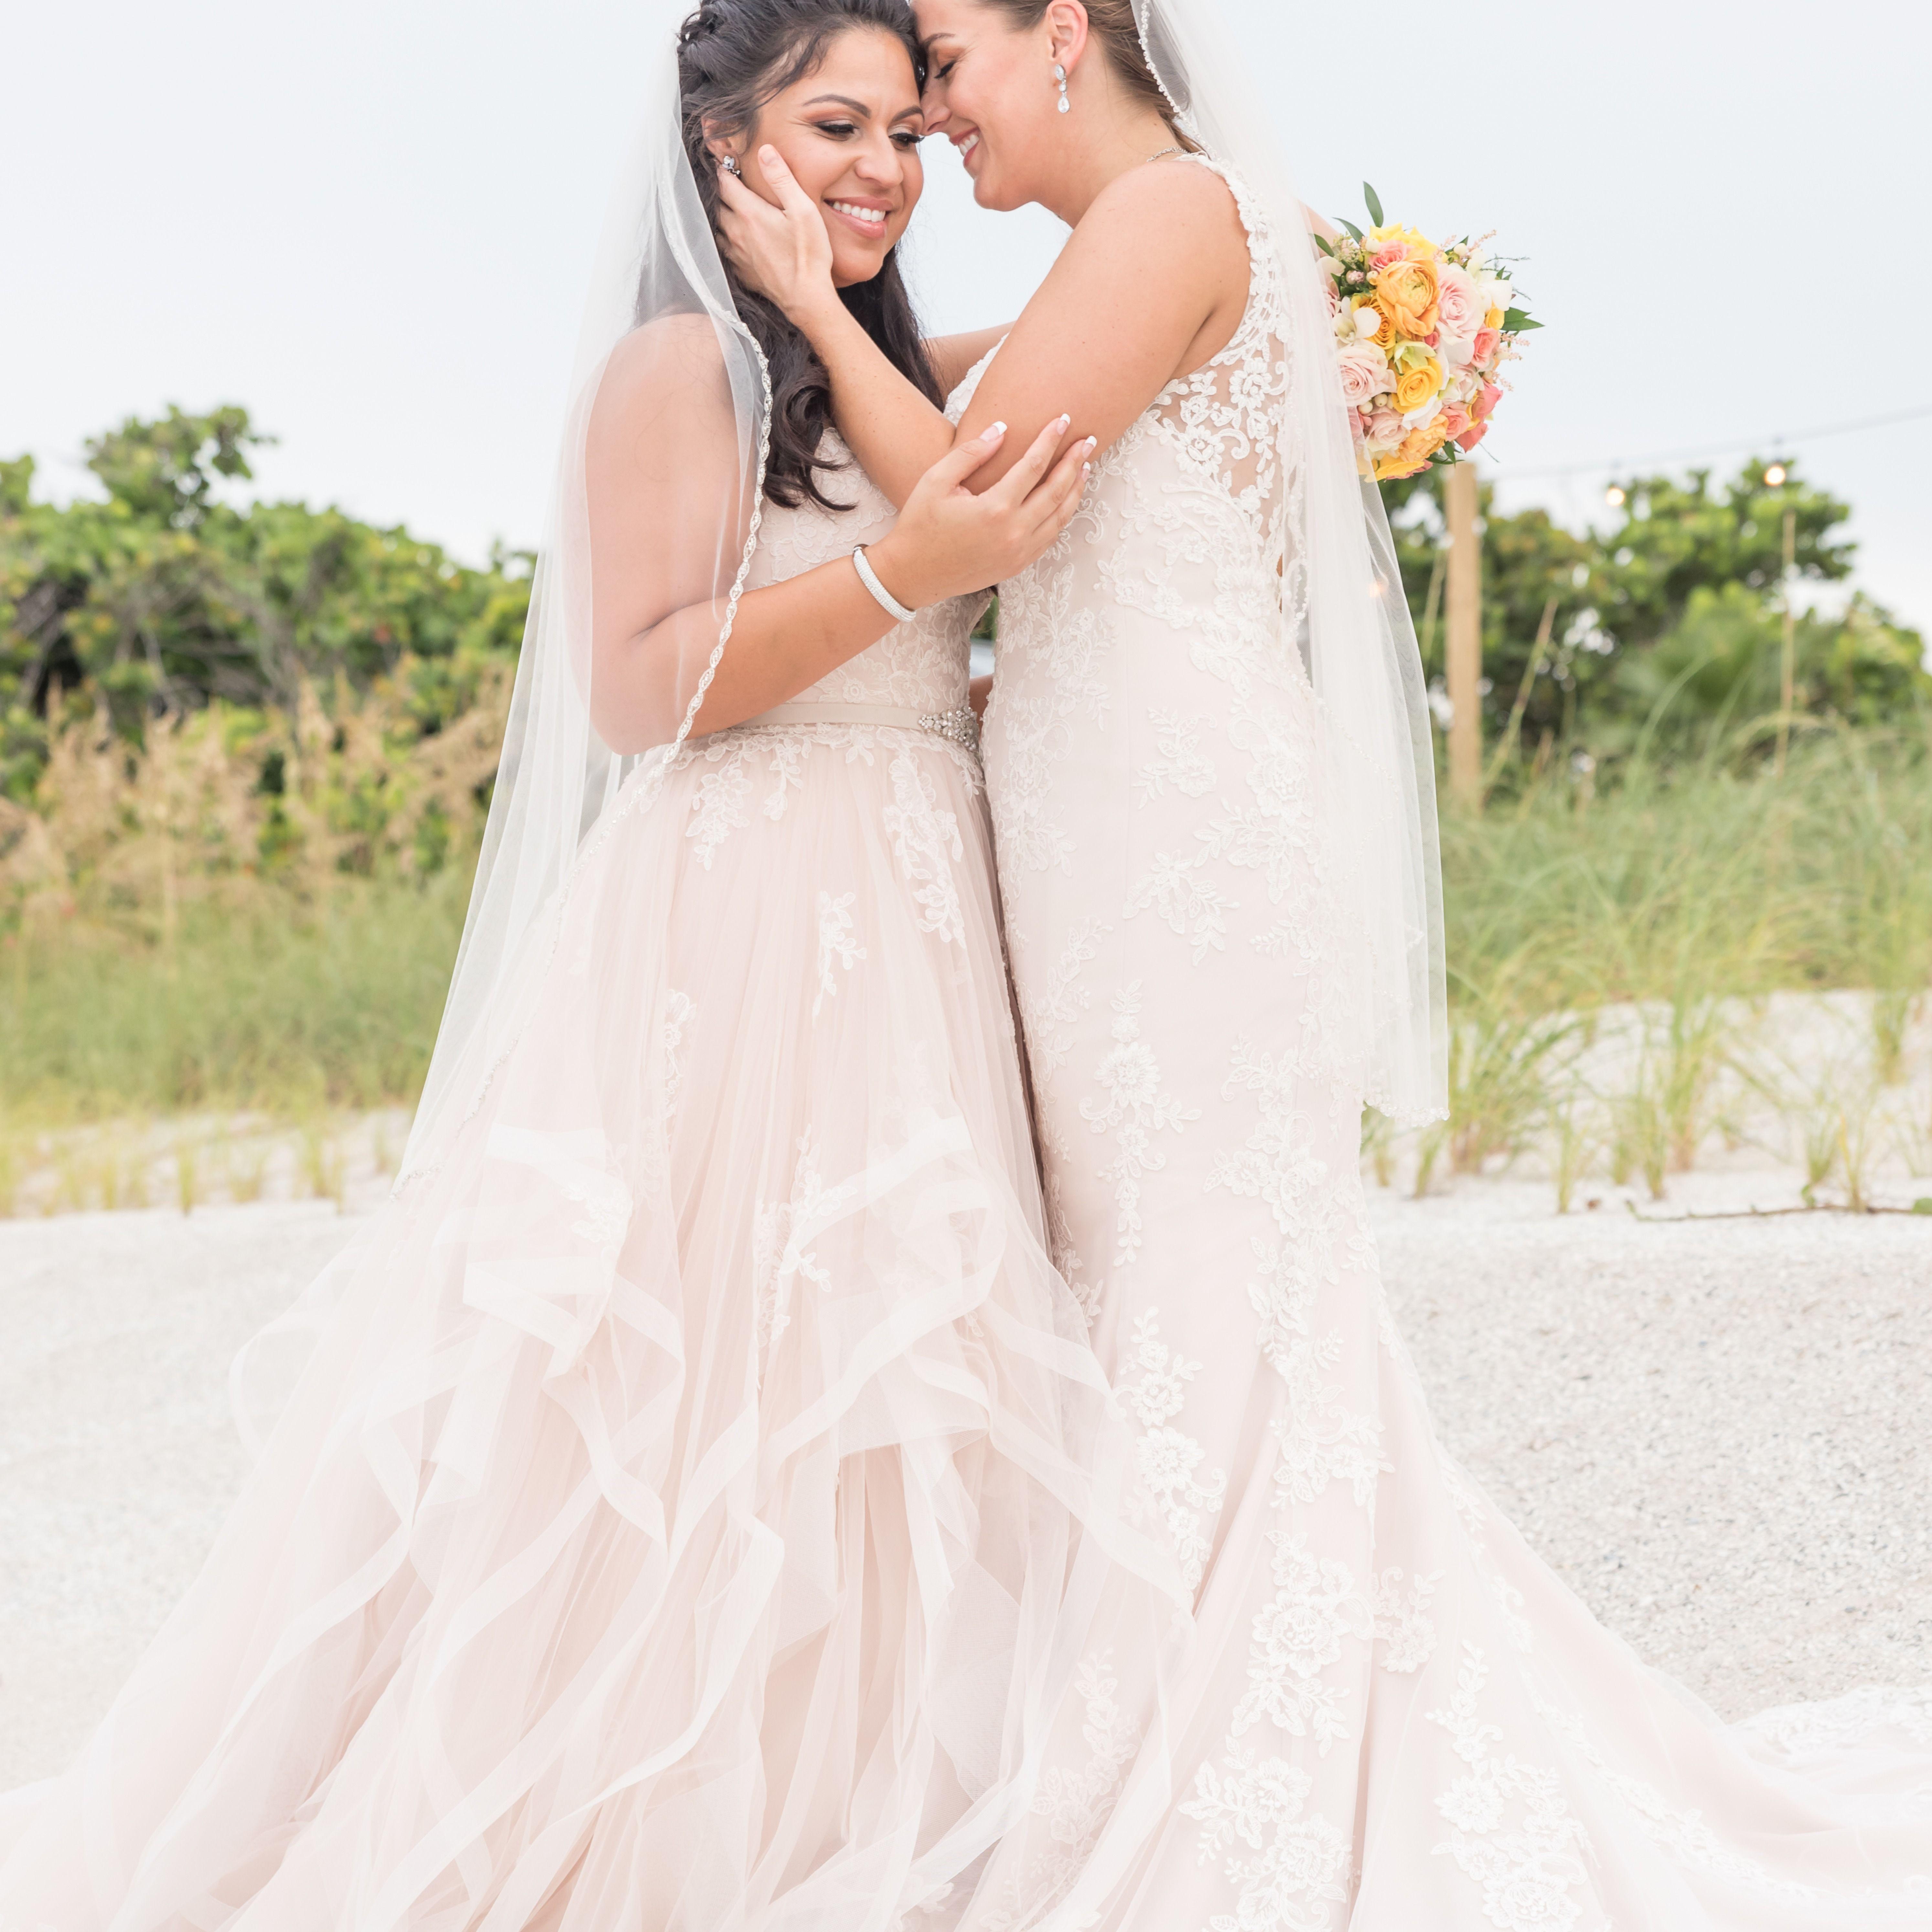 Pin On LGBT Weddings